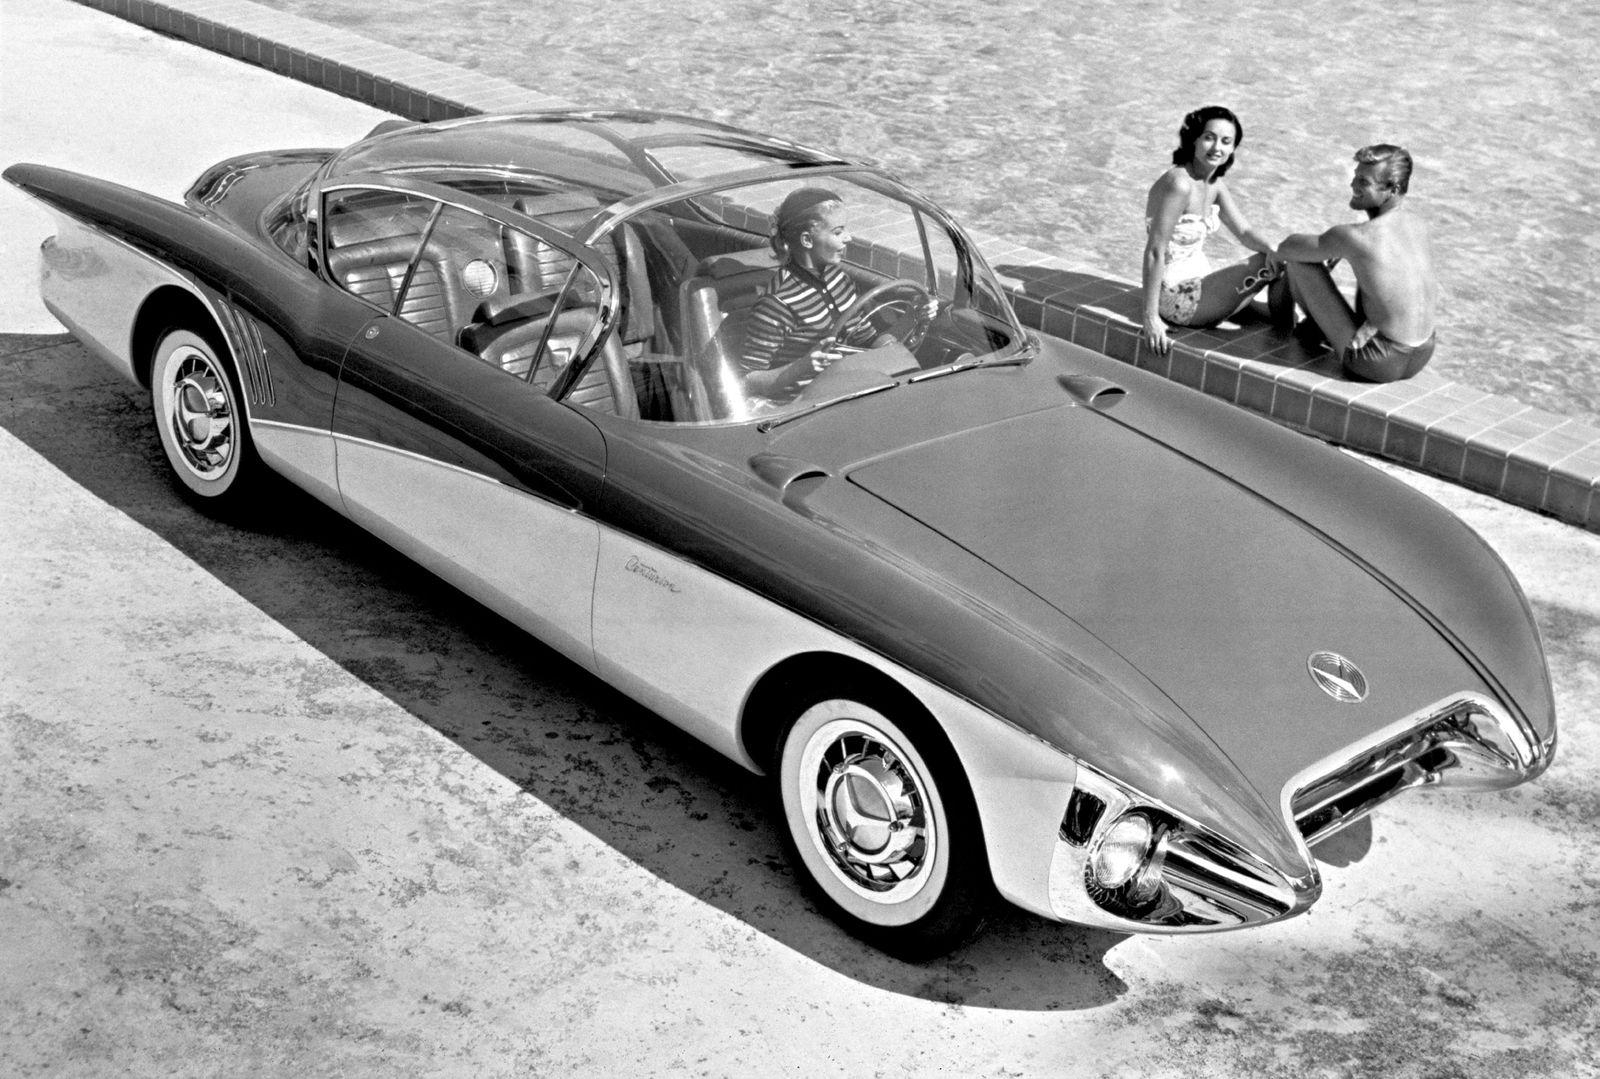 1956 Buick Centurion/ 03EyesOnDesign Eyes On Design